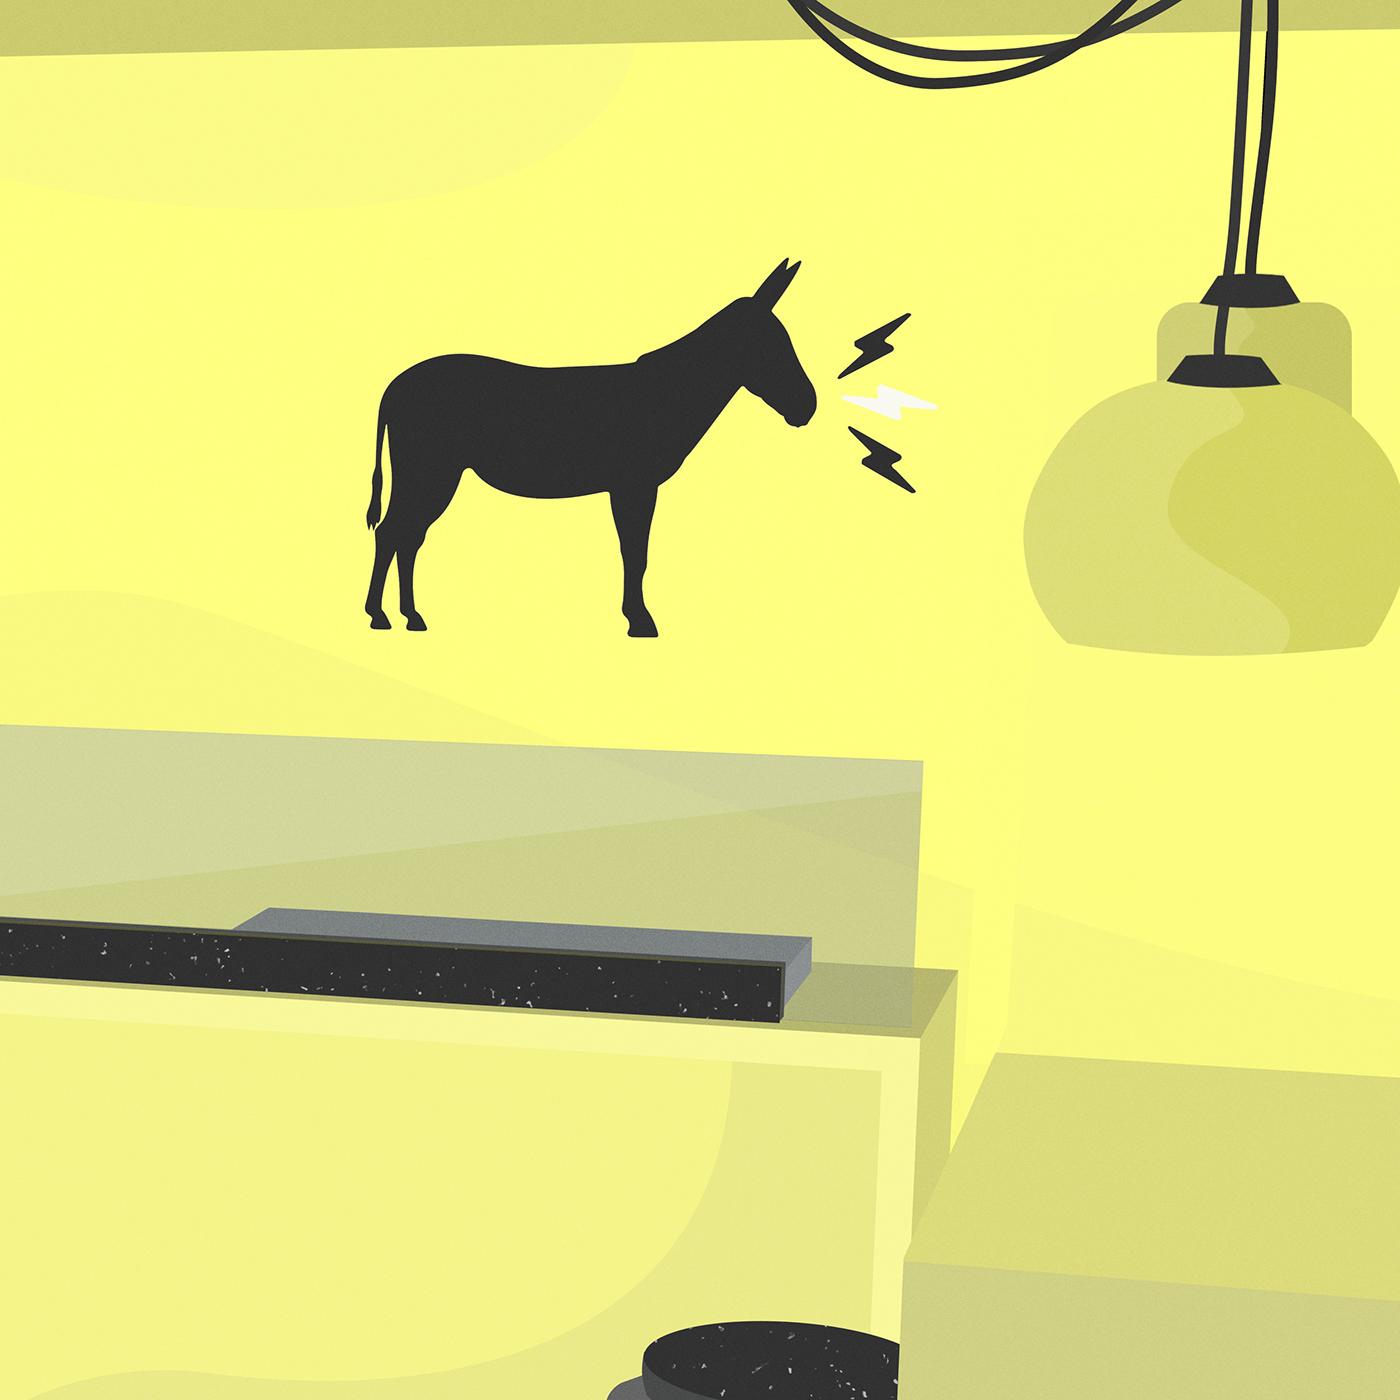 Image may contain: cartoon, animal and horse